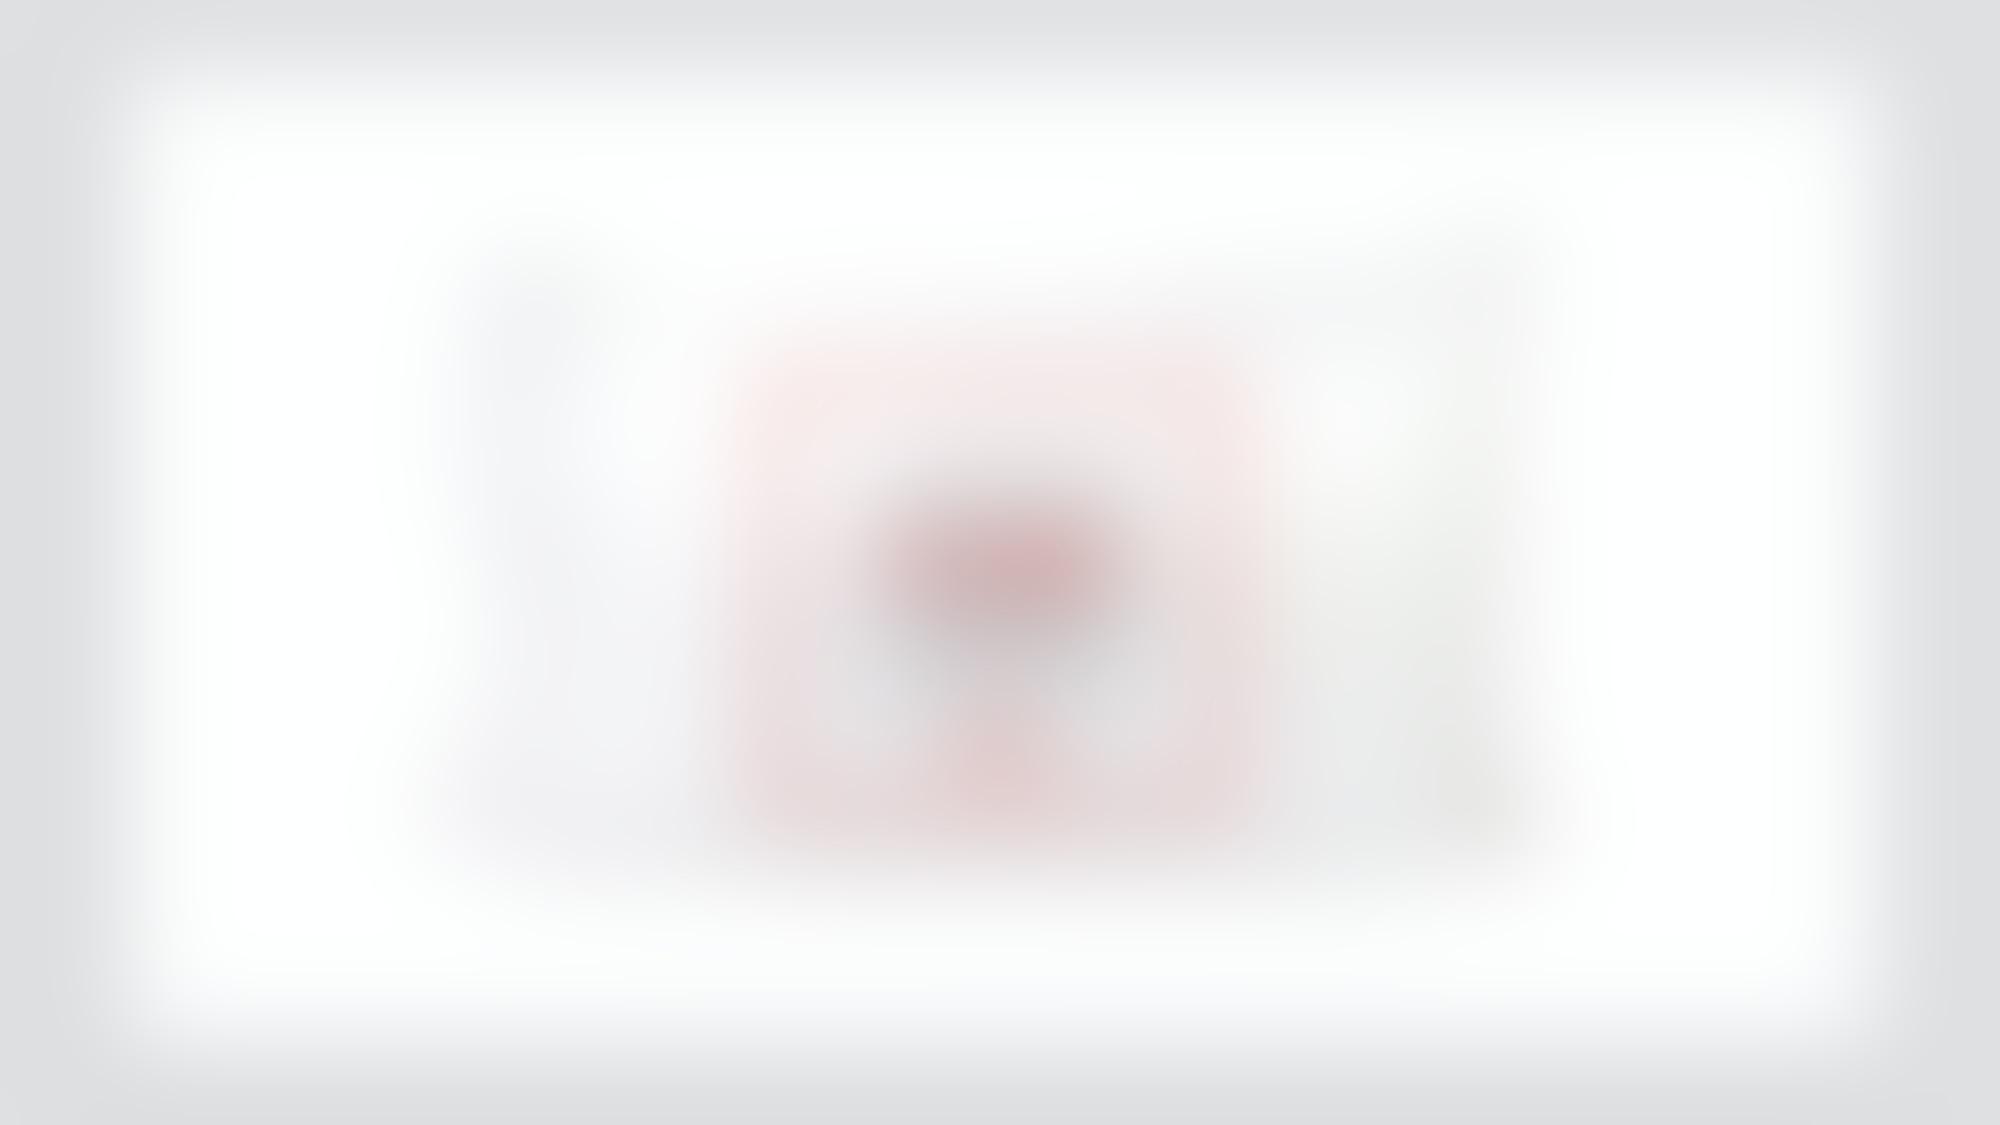 Argos 5 autocompressfitresizeixlibphp 1 1 0max h2000max w3 D2000q80sd7092a81339aa8b0d83f394ebc9a2f0c